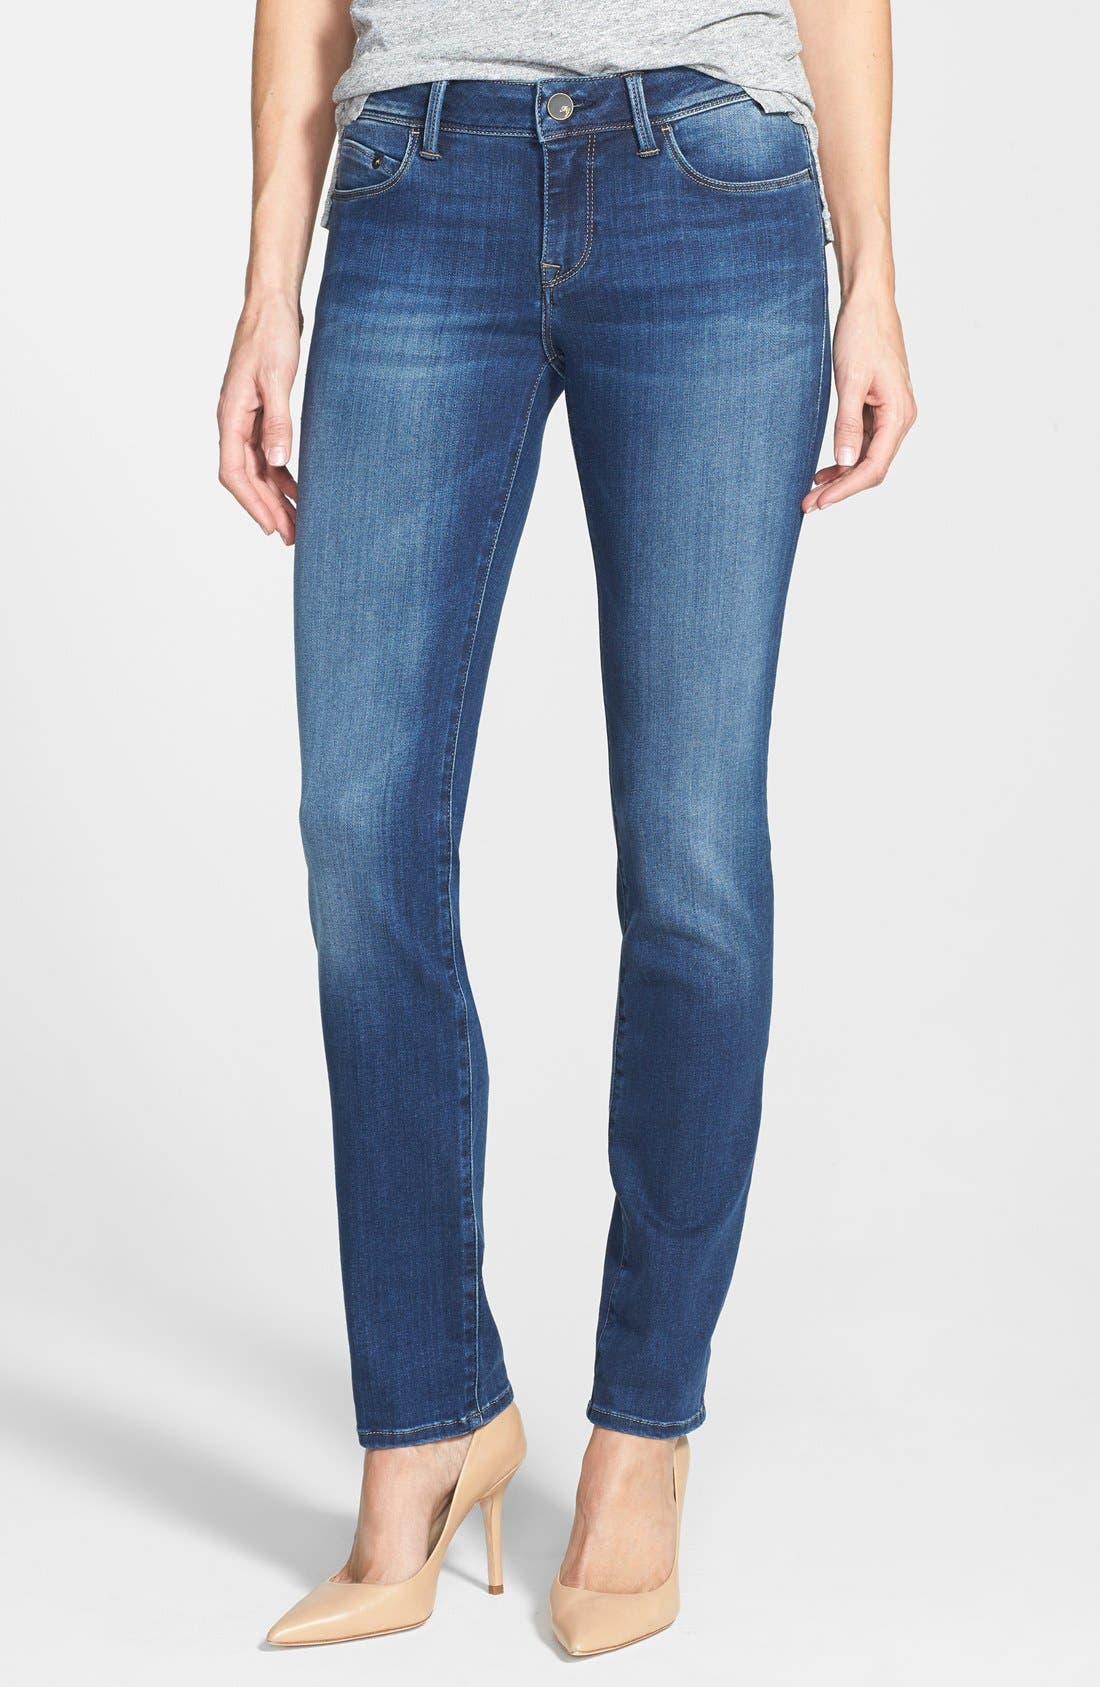 Alternate Image 1 Selected - Mavi Jeans Gold 'Emma' Slim Boyfriend Jeans (Dark)